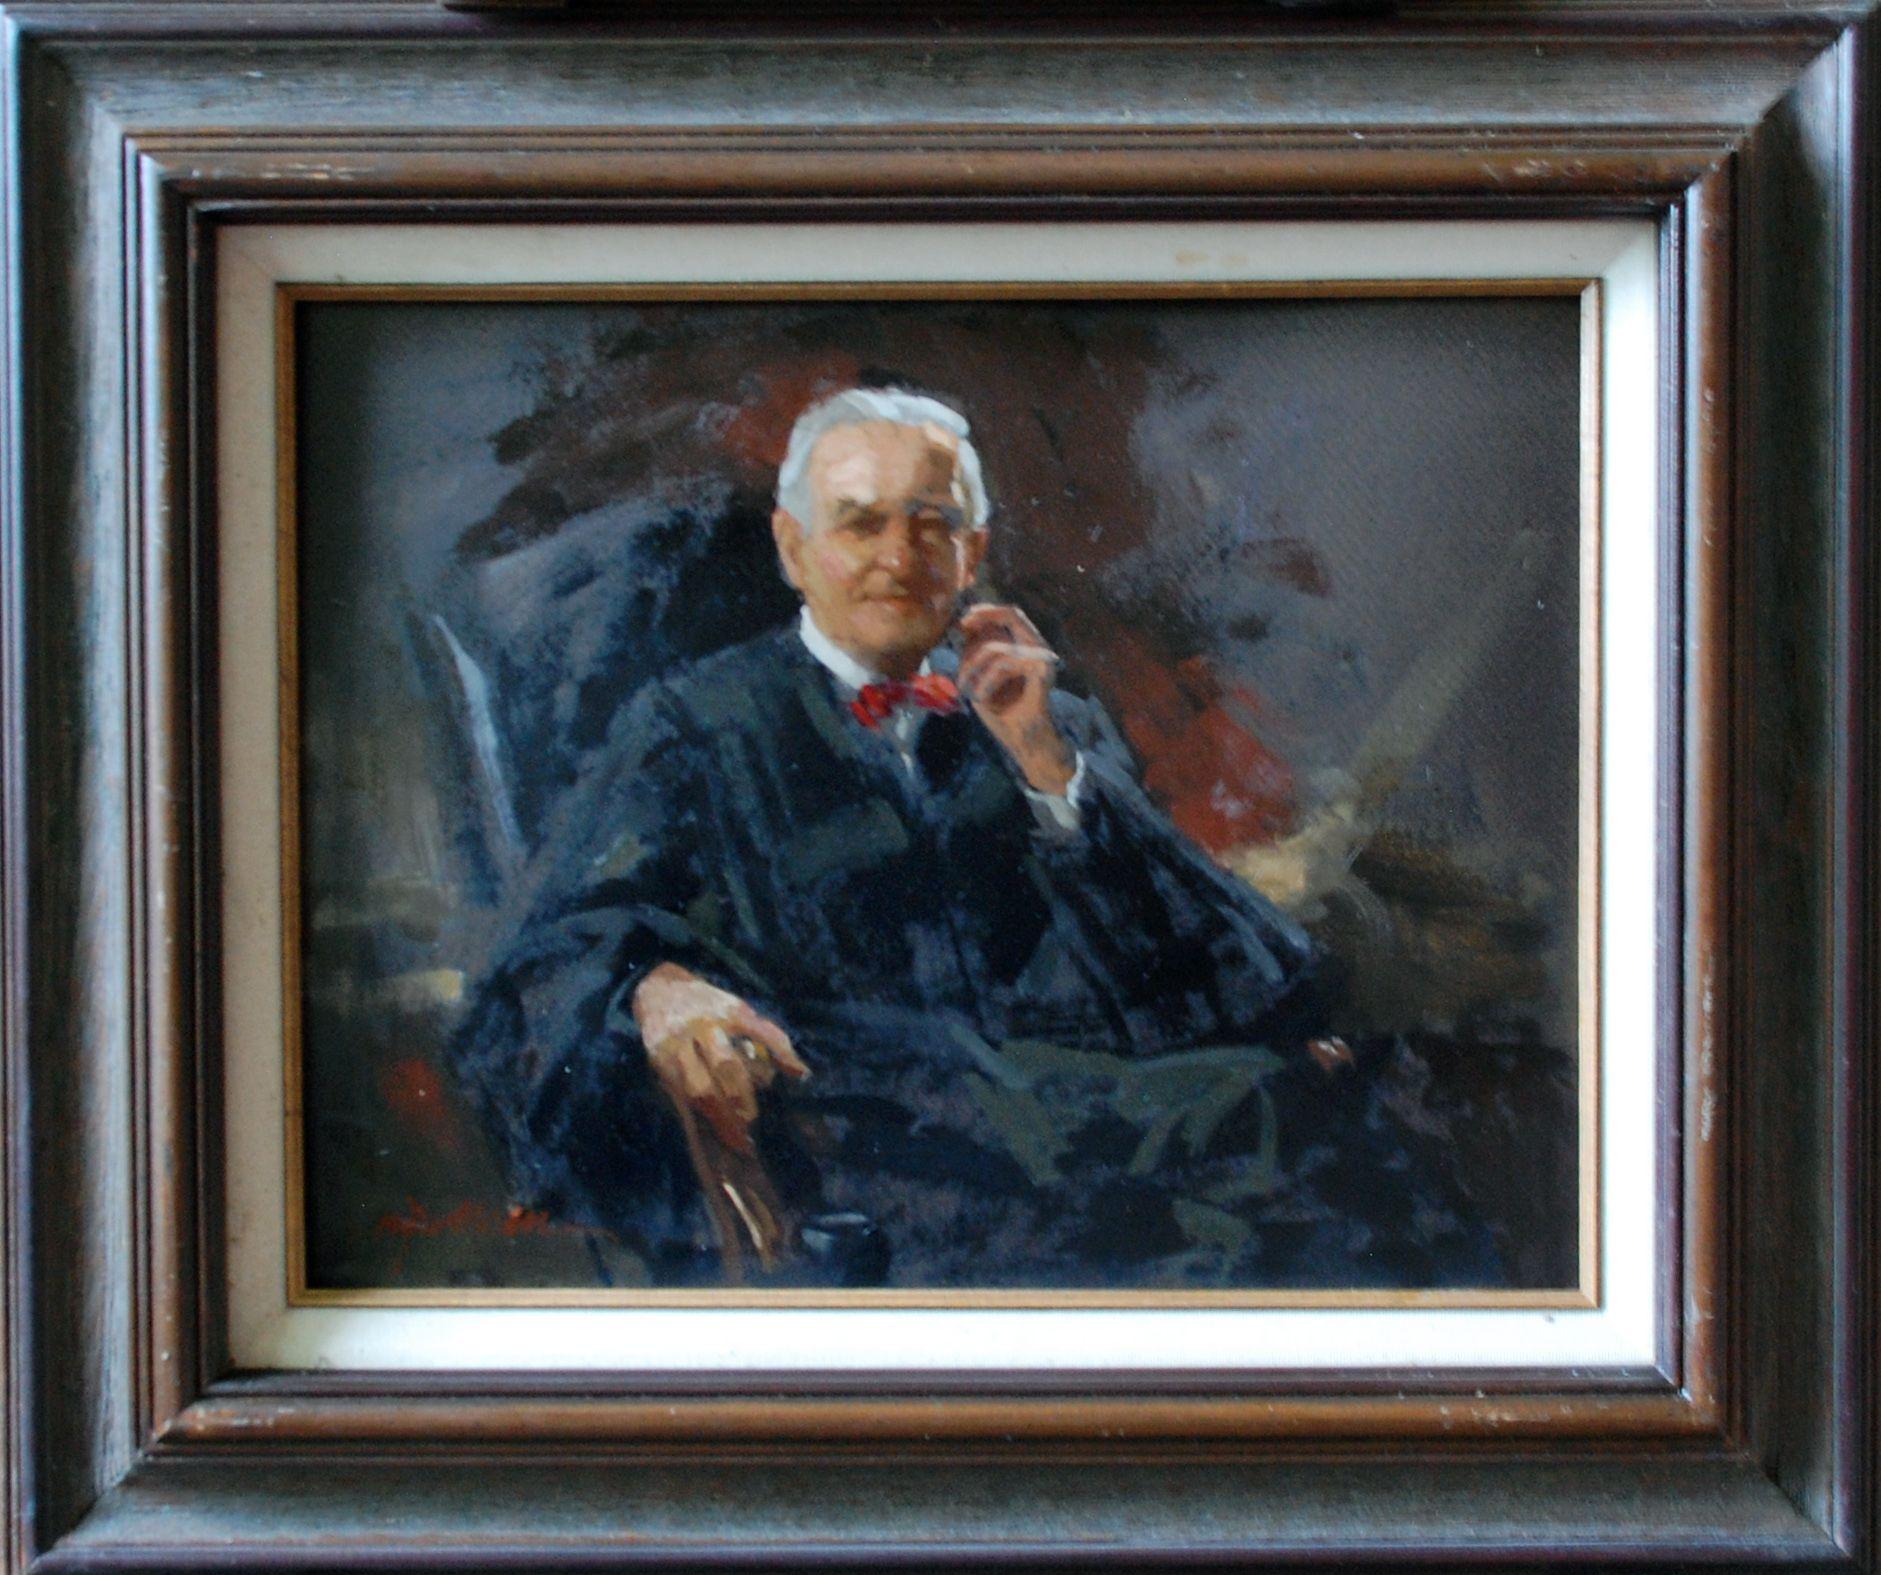 James J Ingwersen Study In Oil Justice John Paul Stevens Painting Art Artist Studio